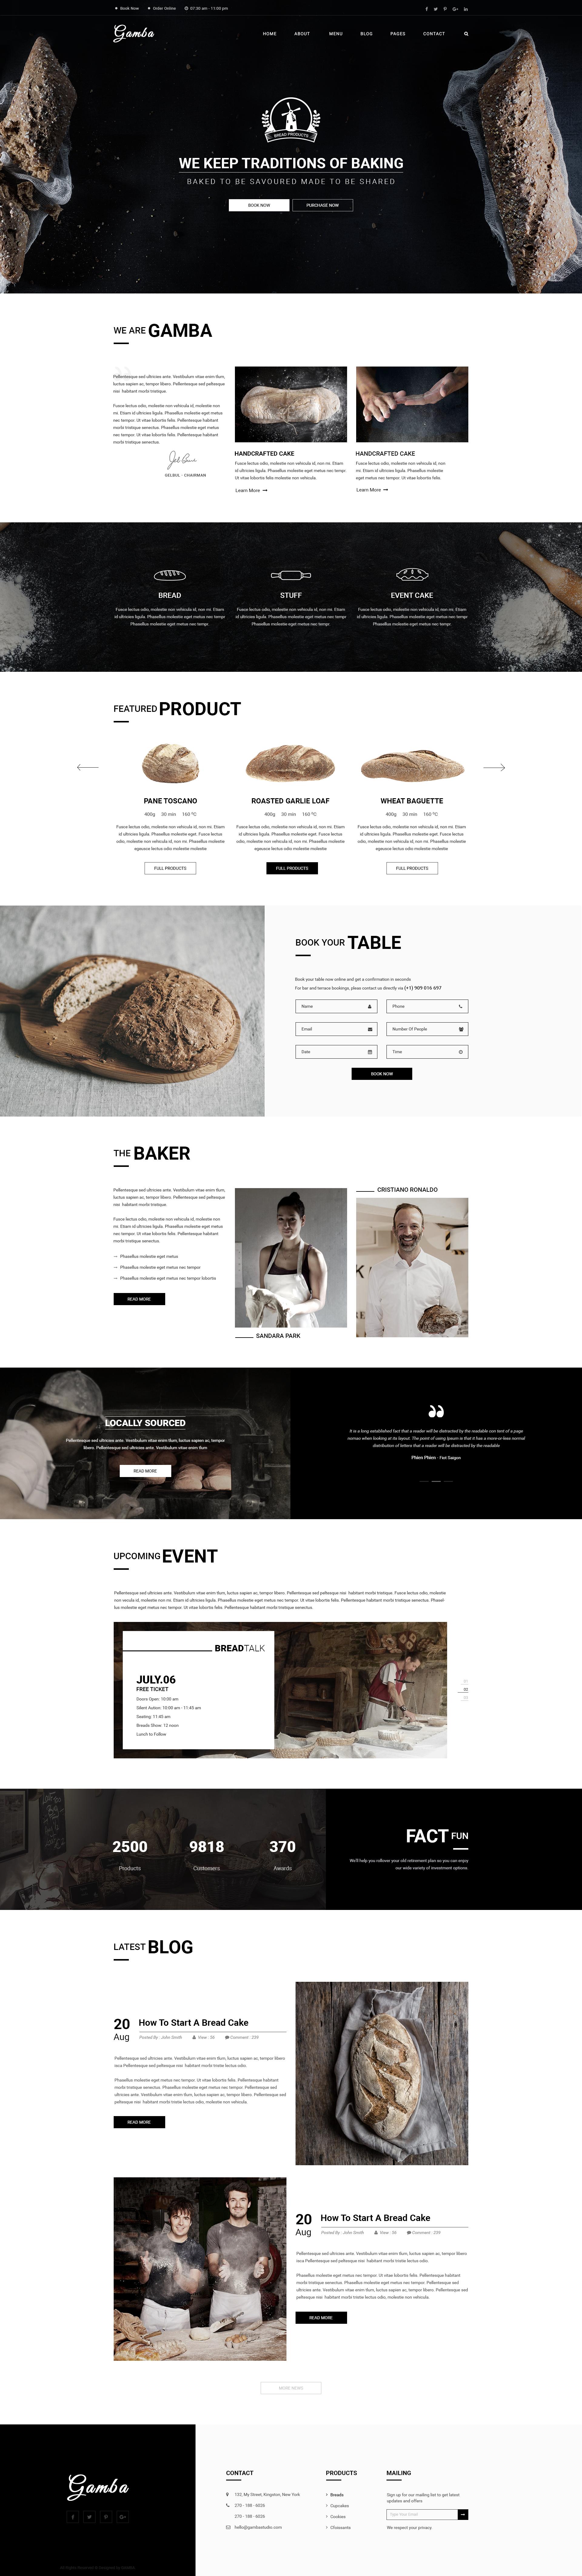 Gamba Bakery, Cakery, Pizza & Pastry Shop PSD Template by GambaThemes